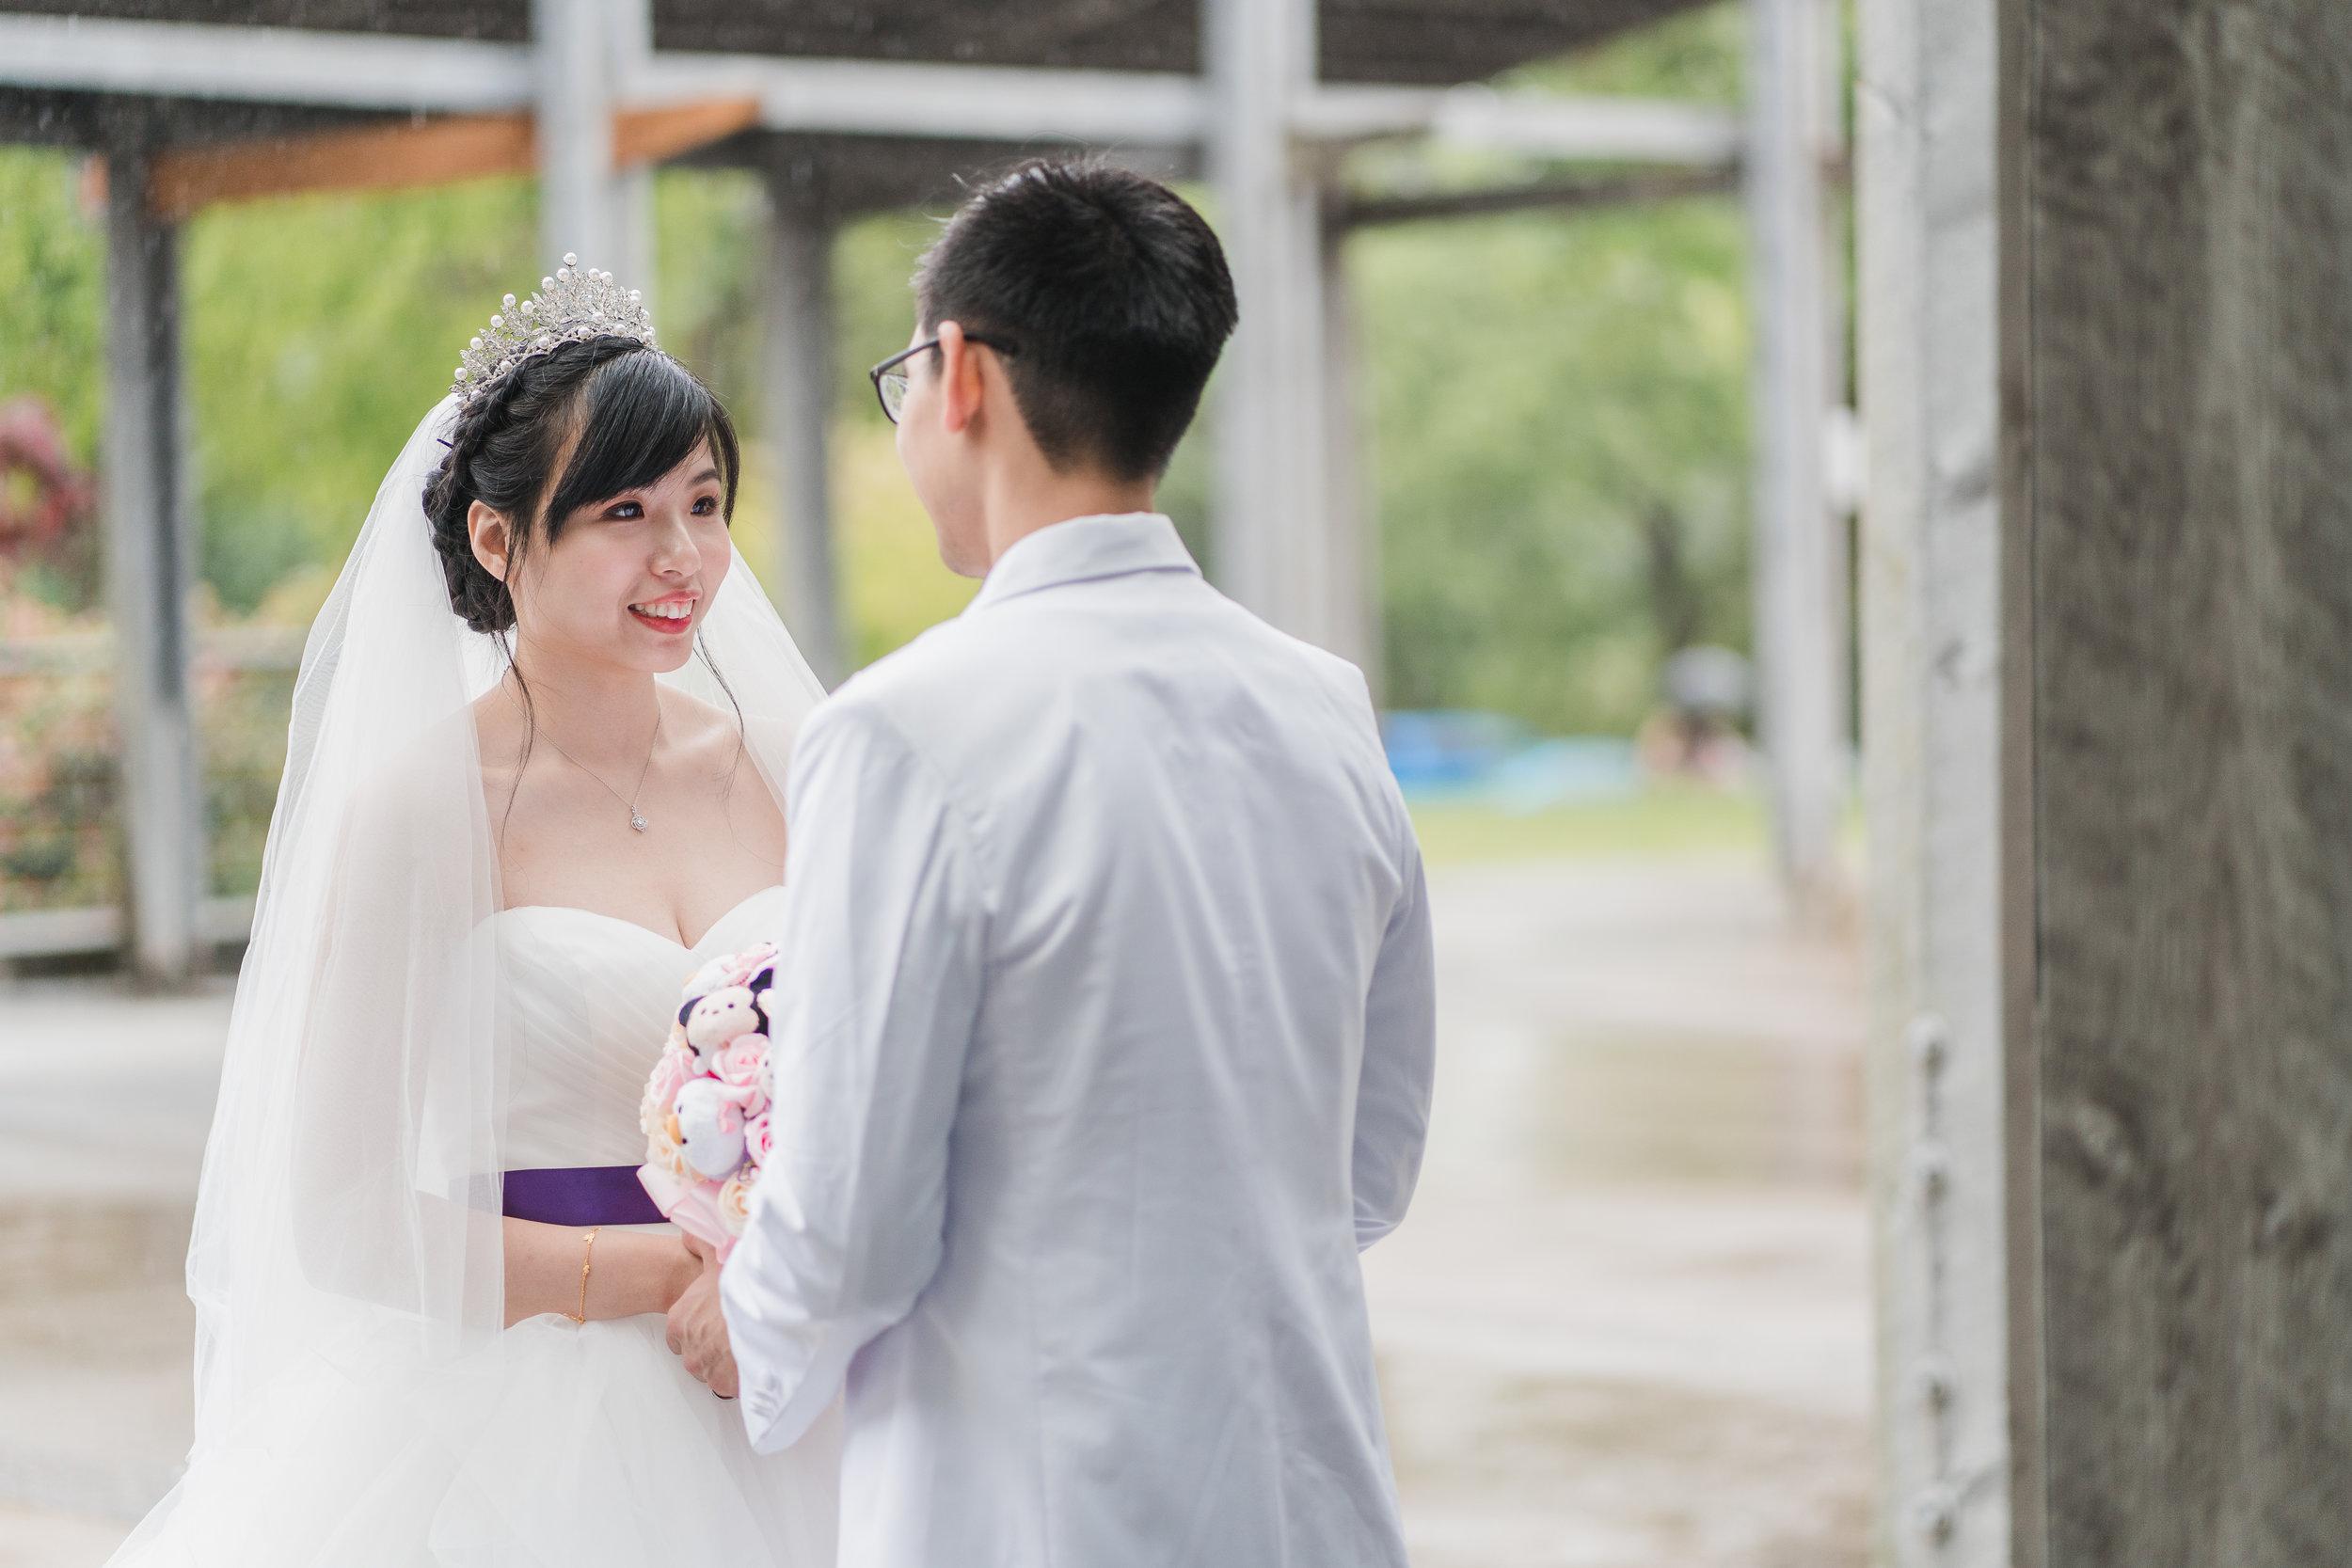 20190520 - Pamela & Matthew Wedding - 0206.jpg